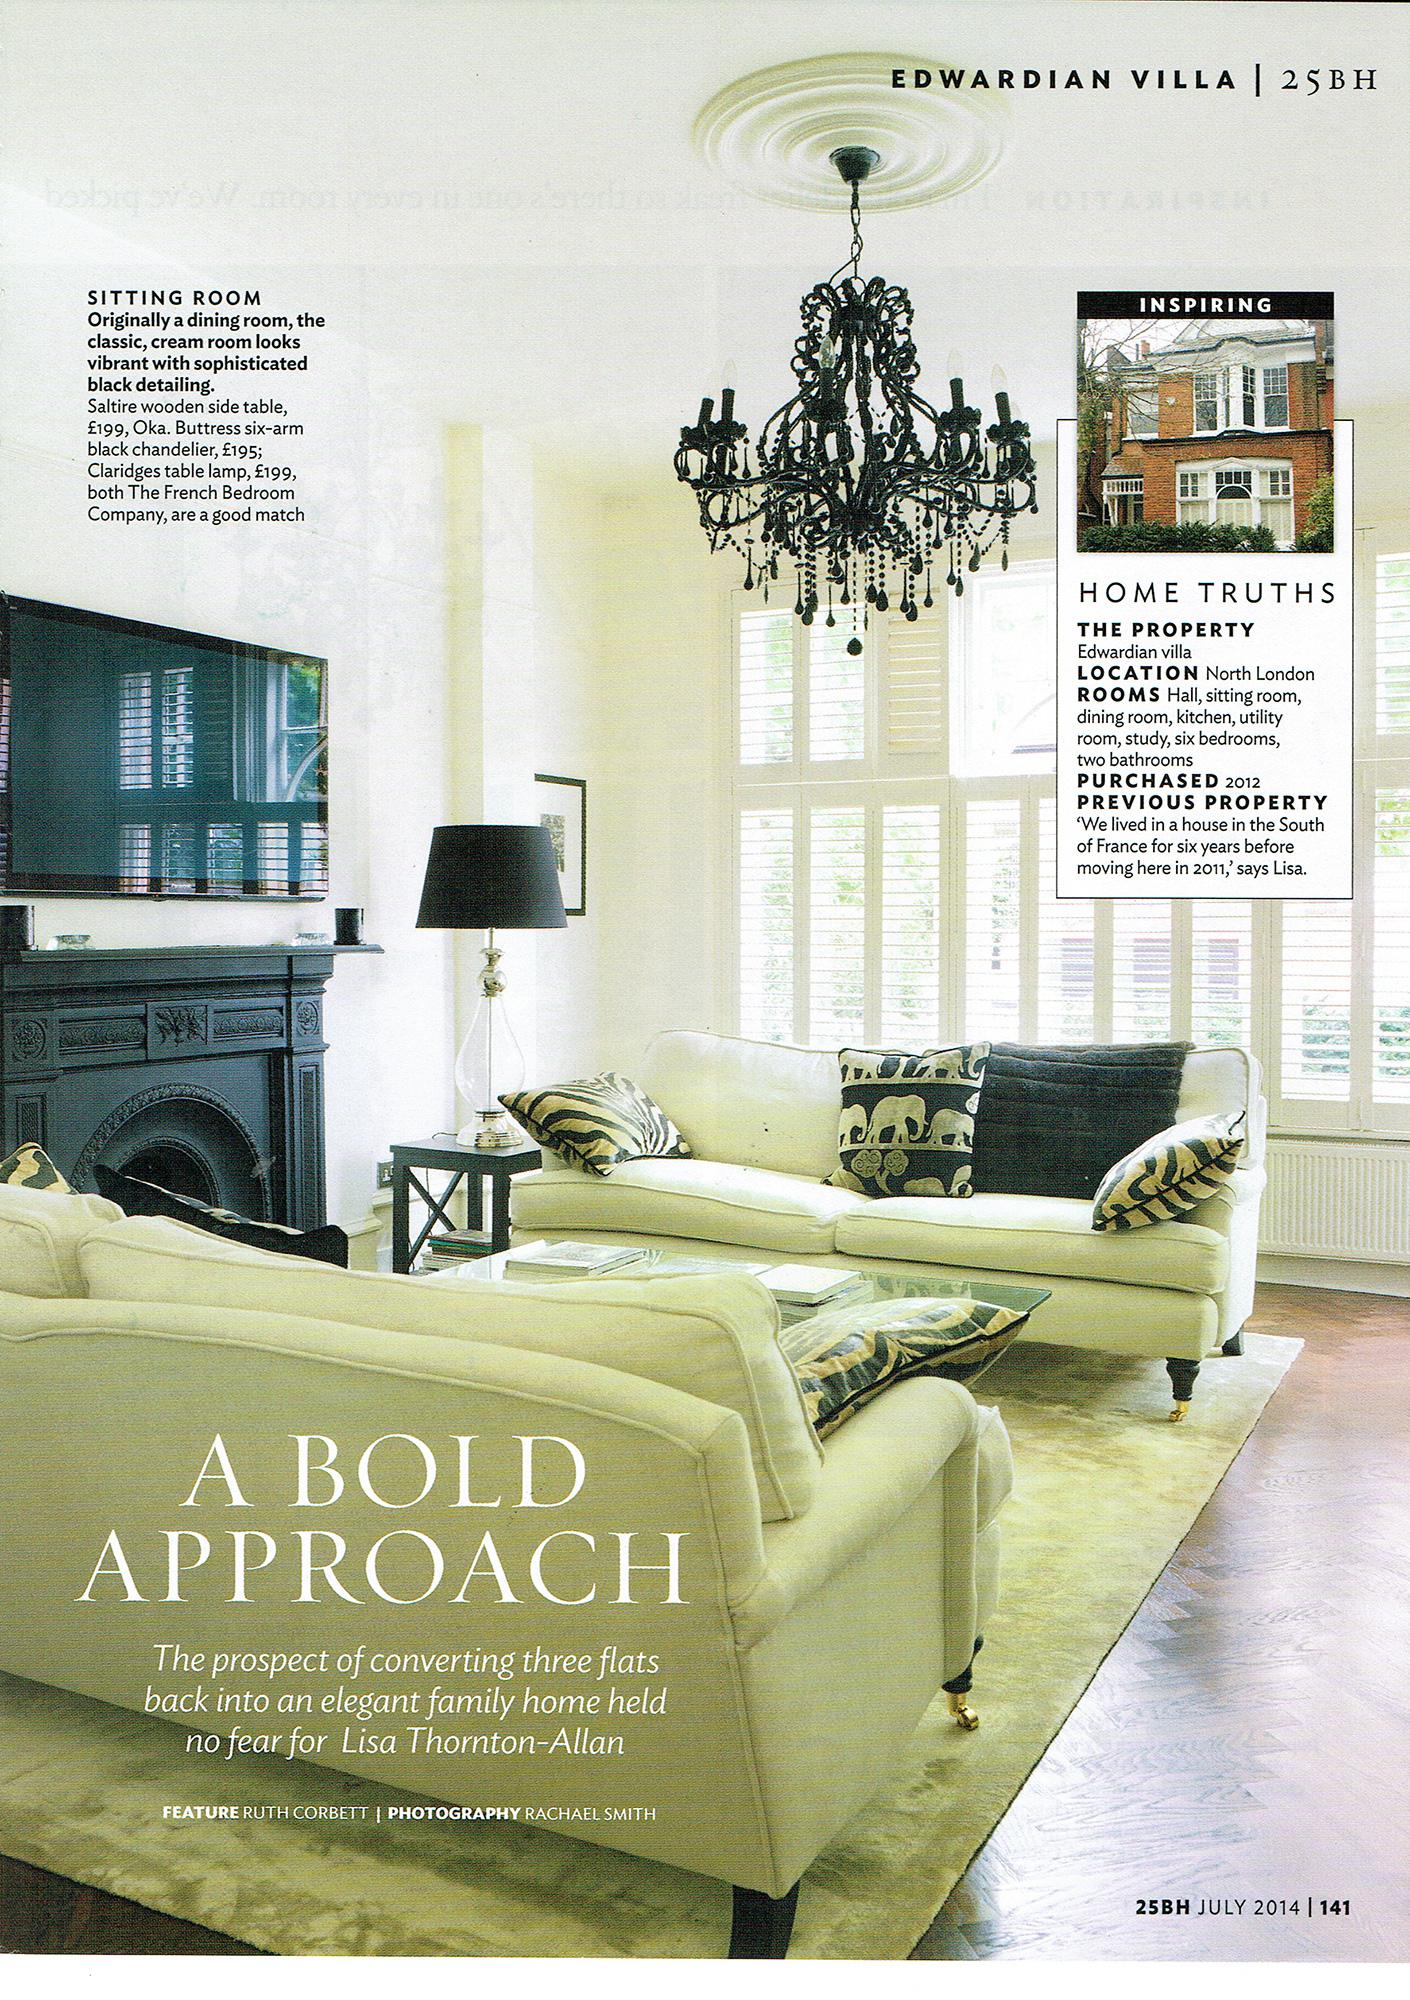 Thornton allan interiors press interior design for Interior design consultancy london